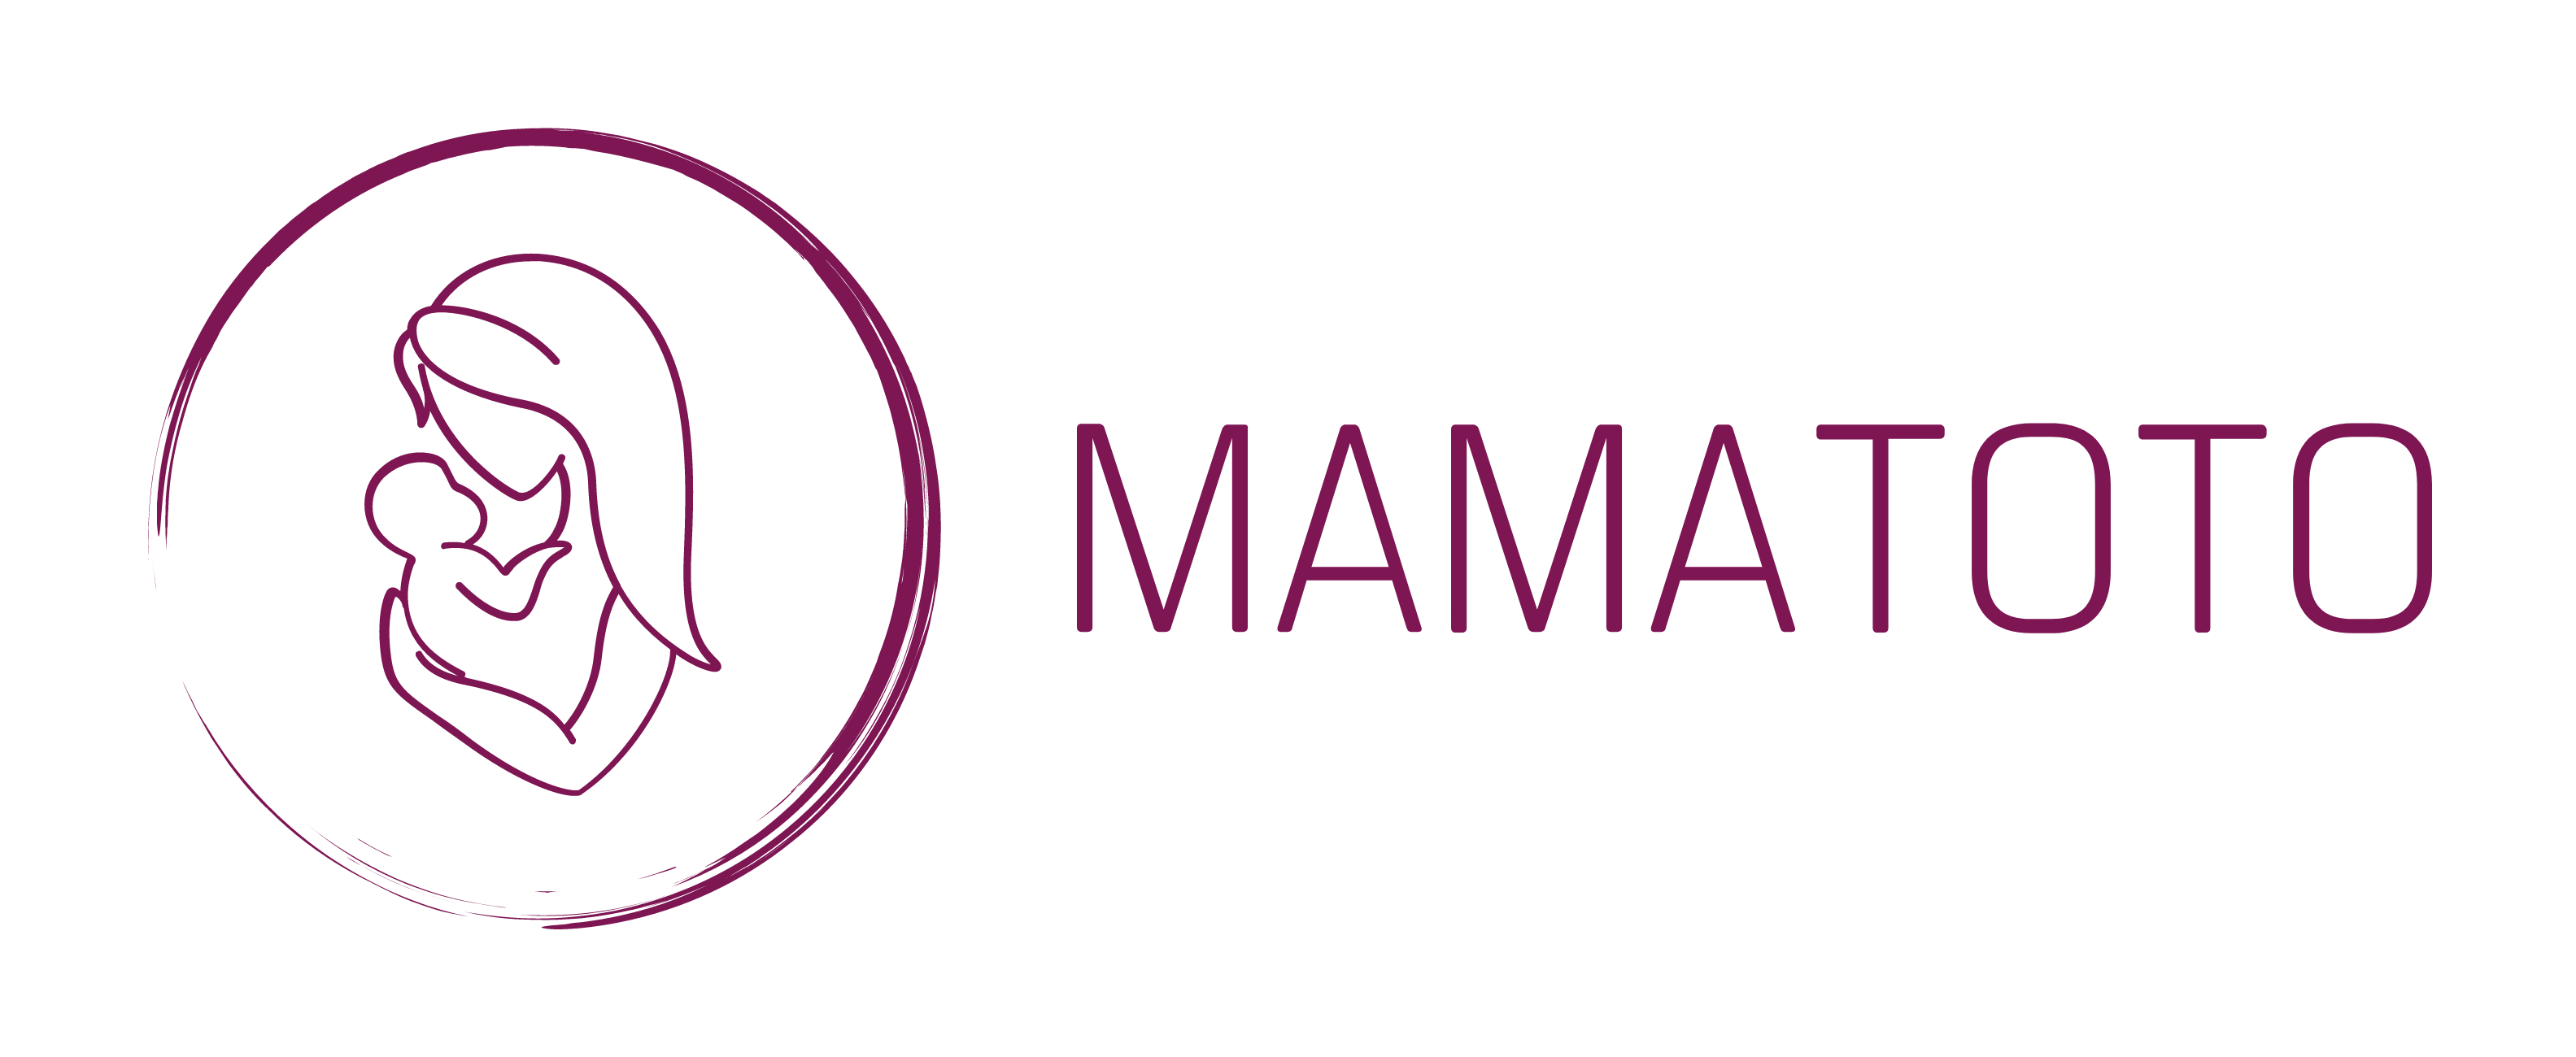 Mamatoto's logo